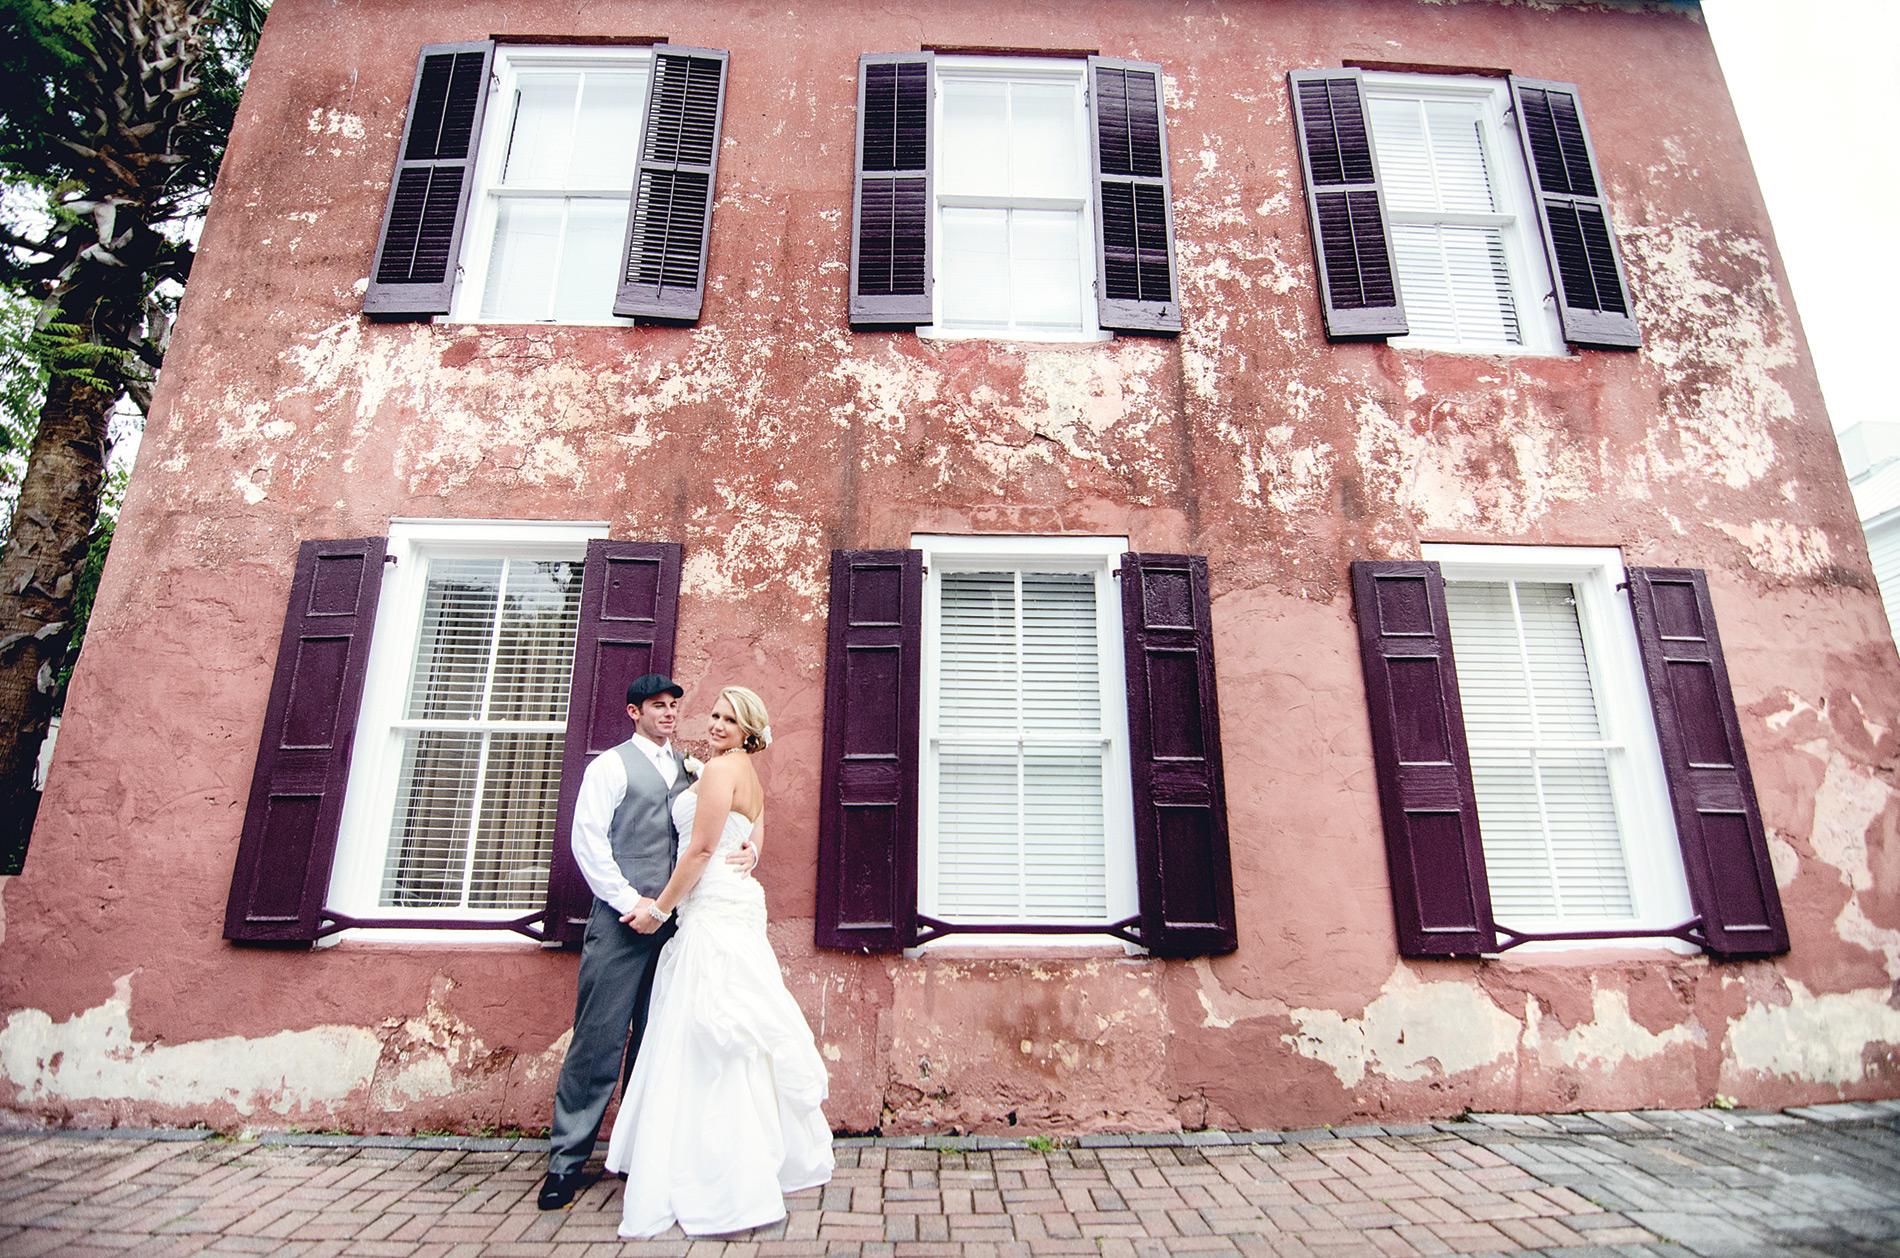 st-augustine-wedding-venues-white-room-historic-buildings